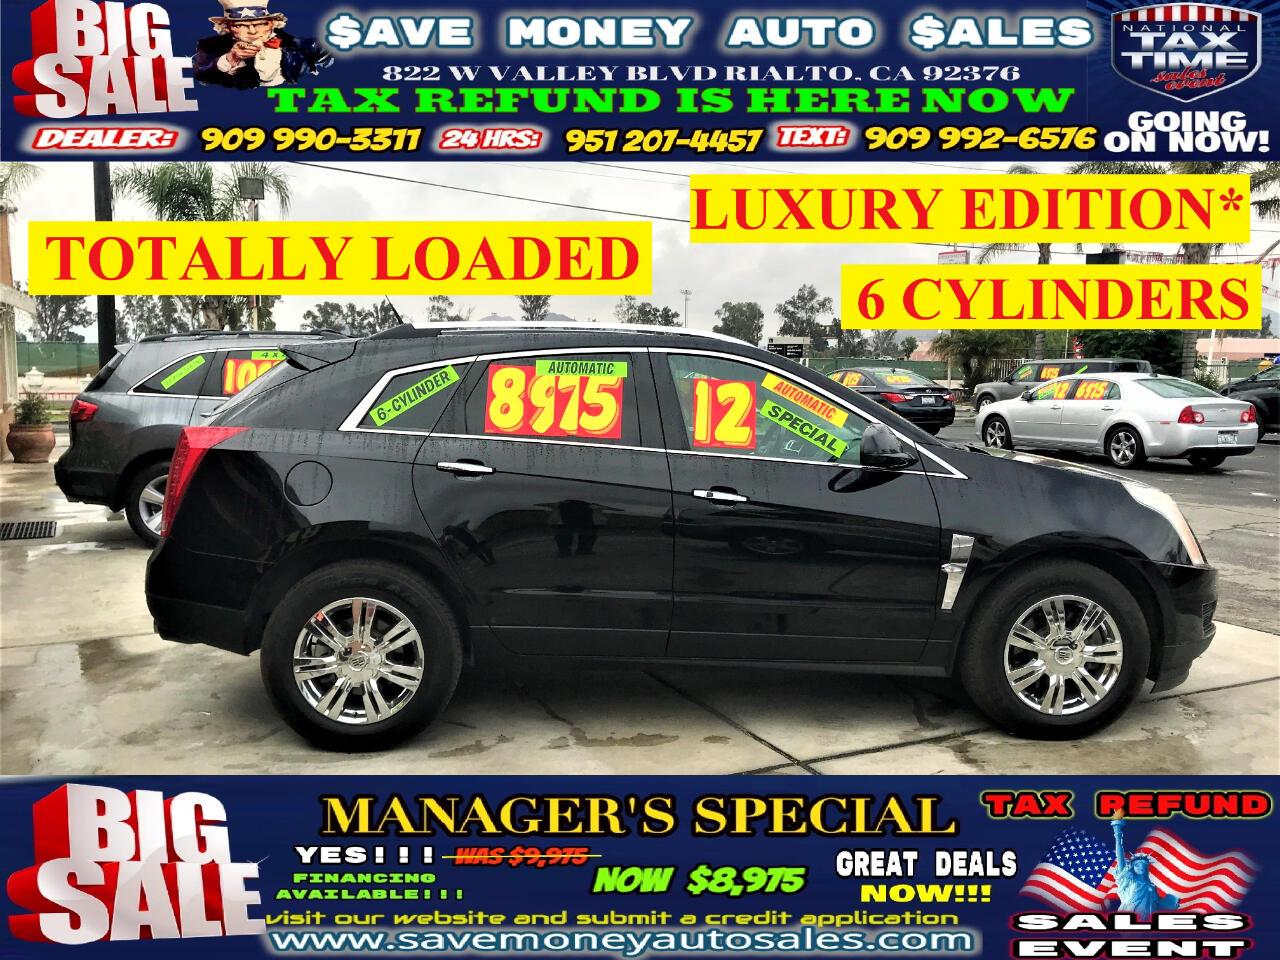 2012 Cadillac SRX LUXURY EDITION>BACK UP CAMERA>BLUETOOTH>6CYLDS